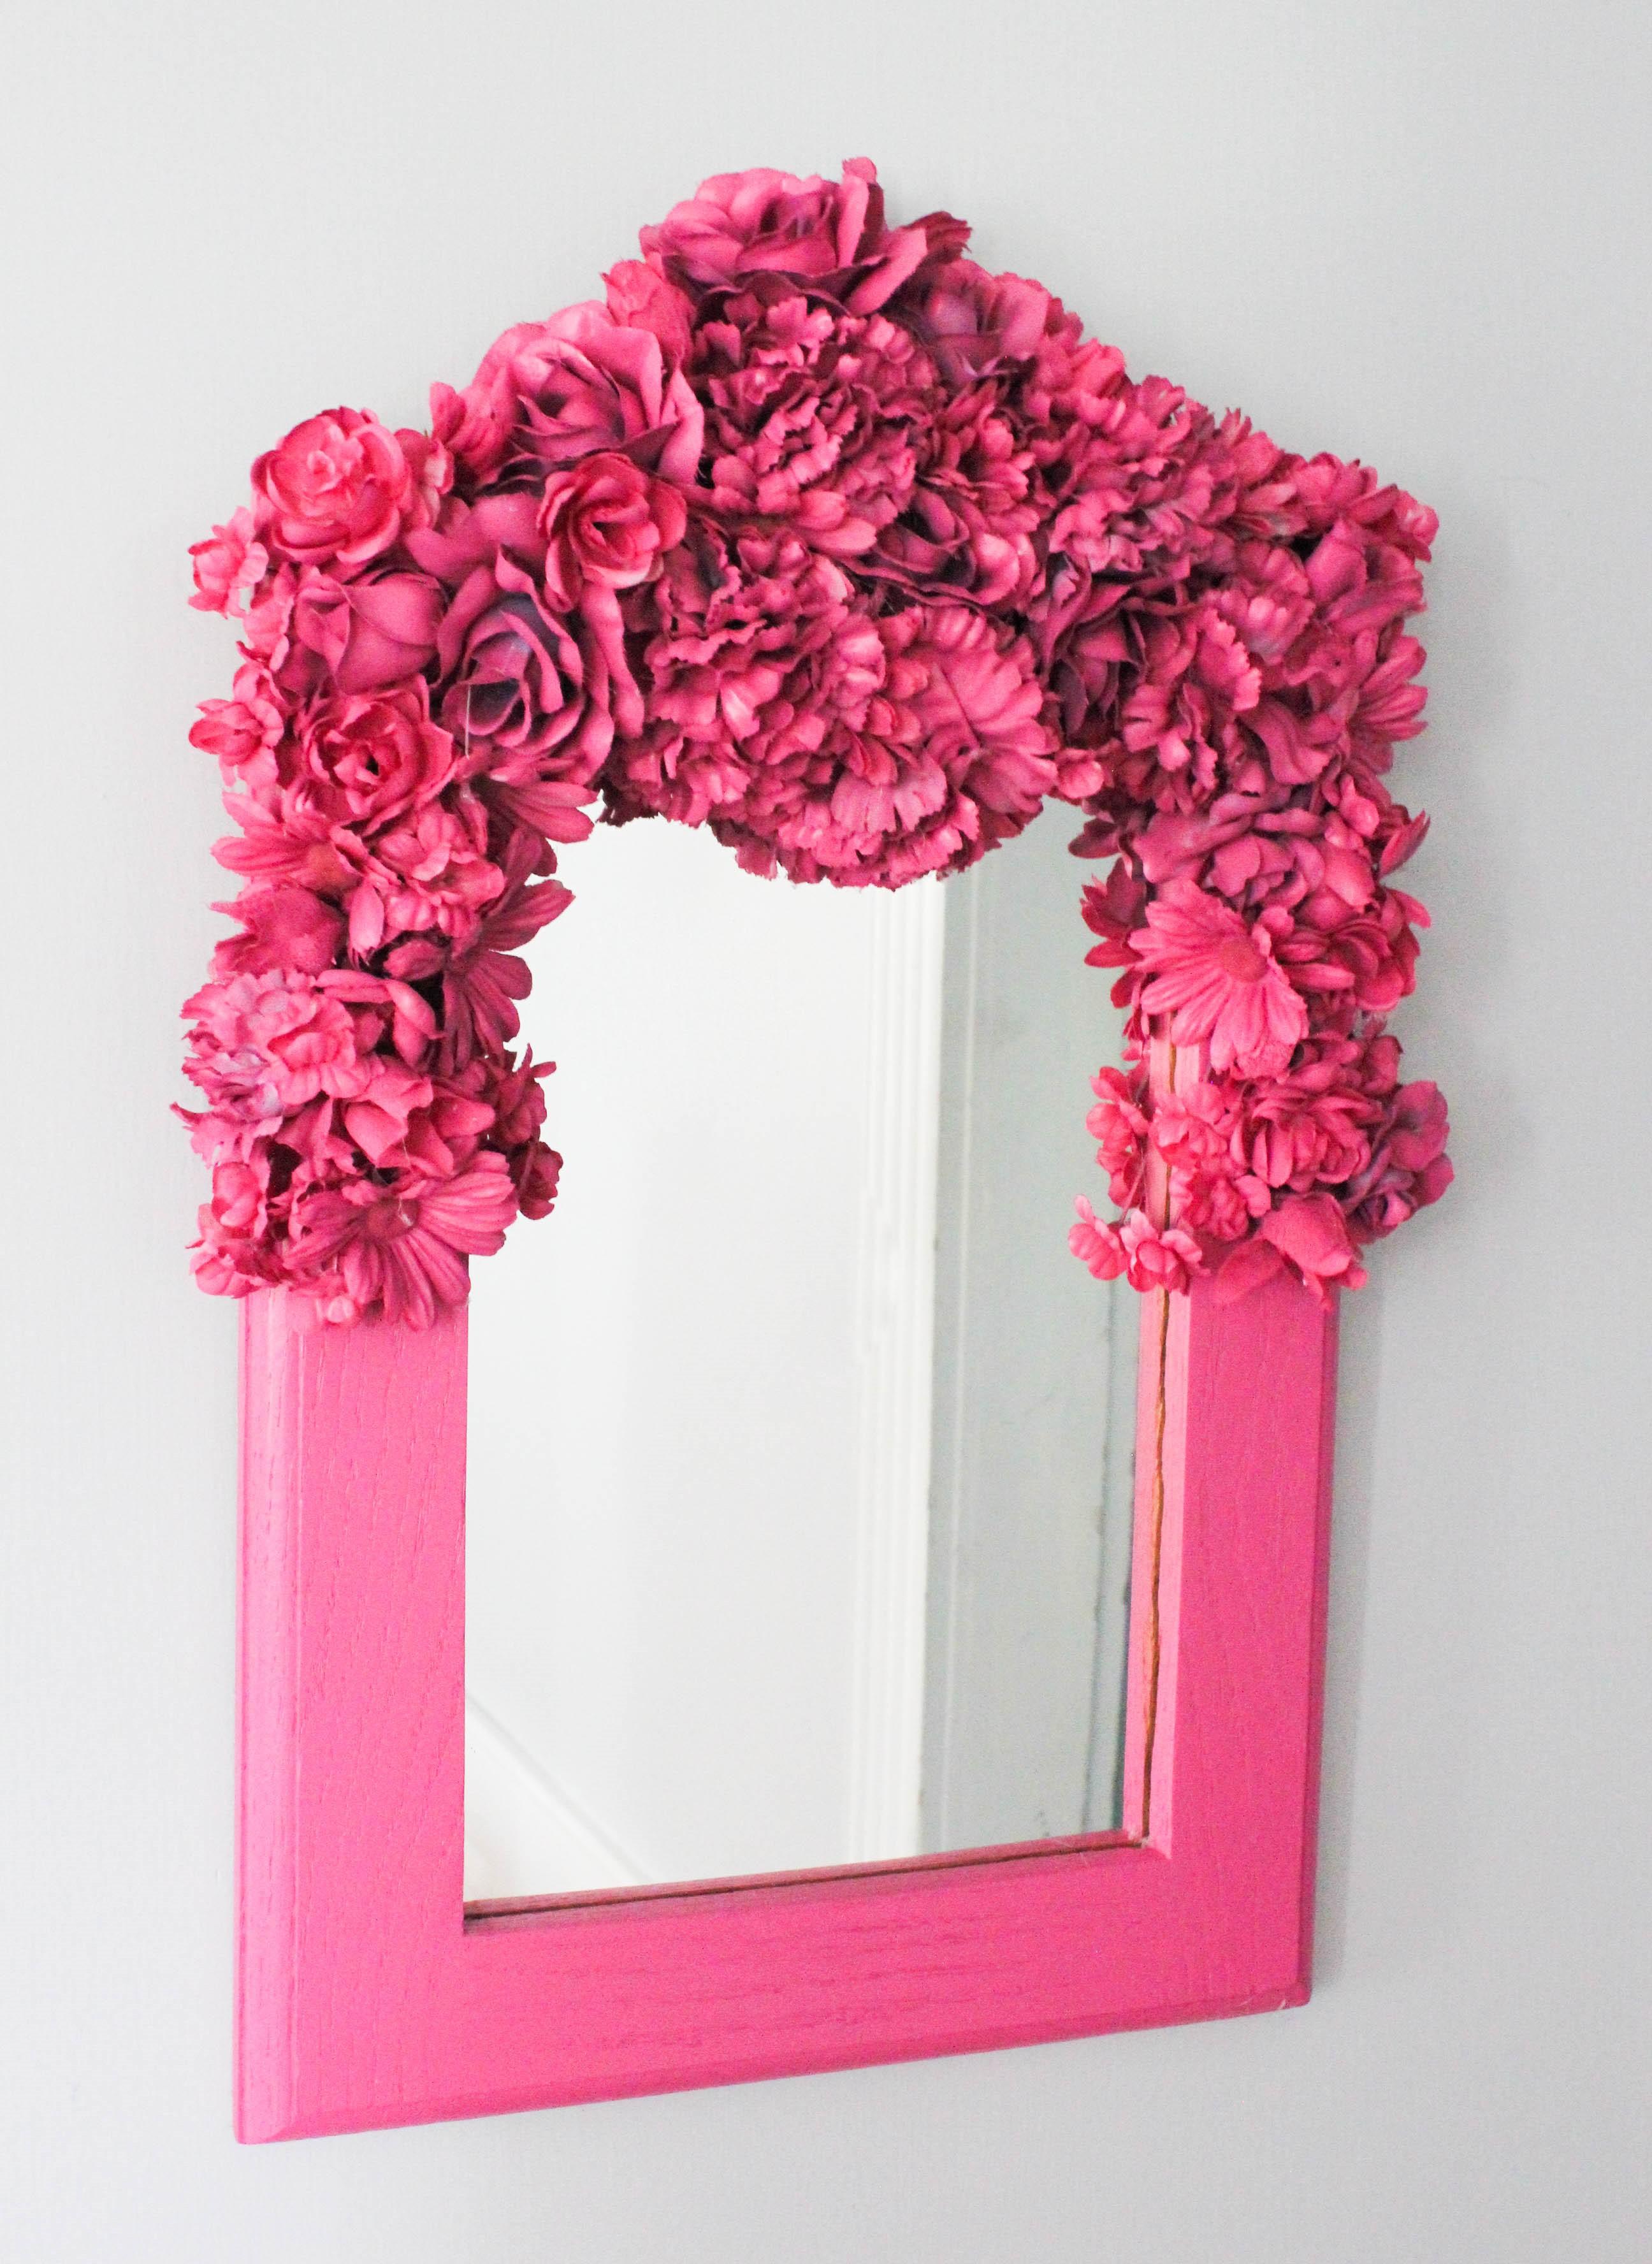 1 Mirror with Silk Flowers & Spray Paint